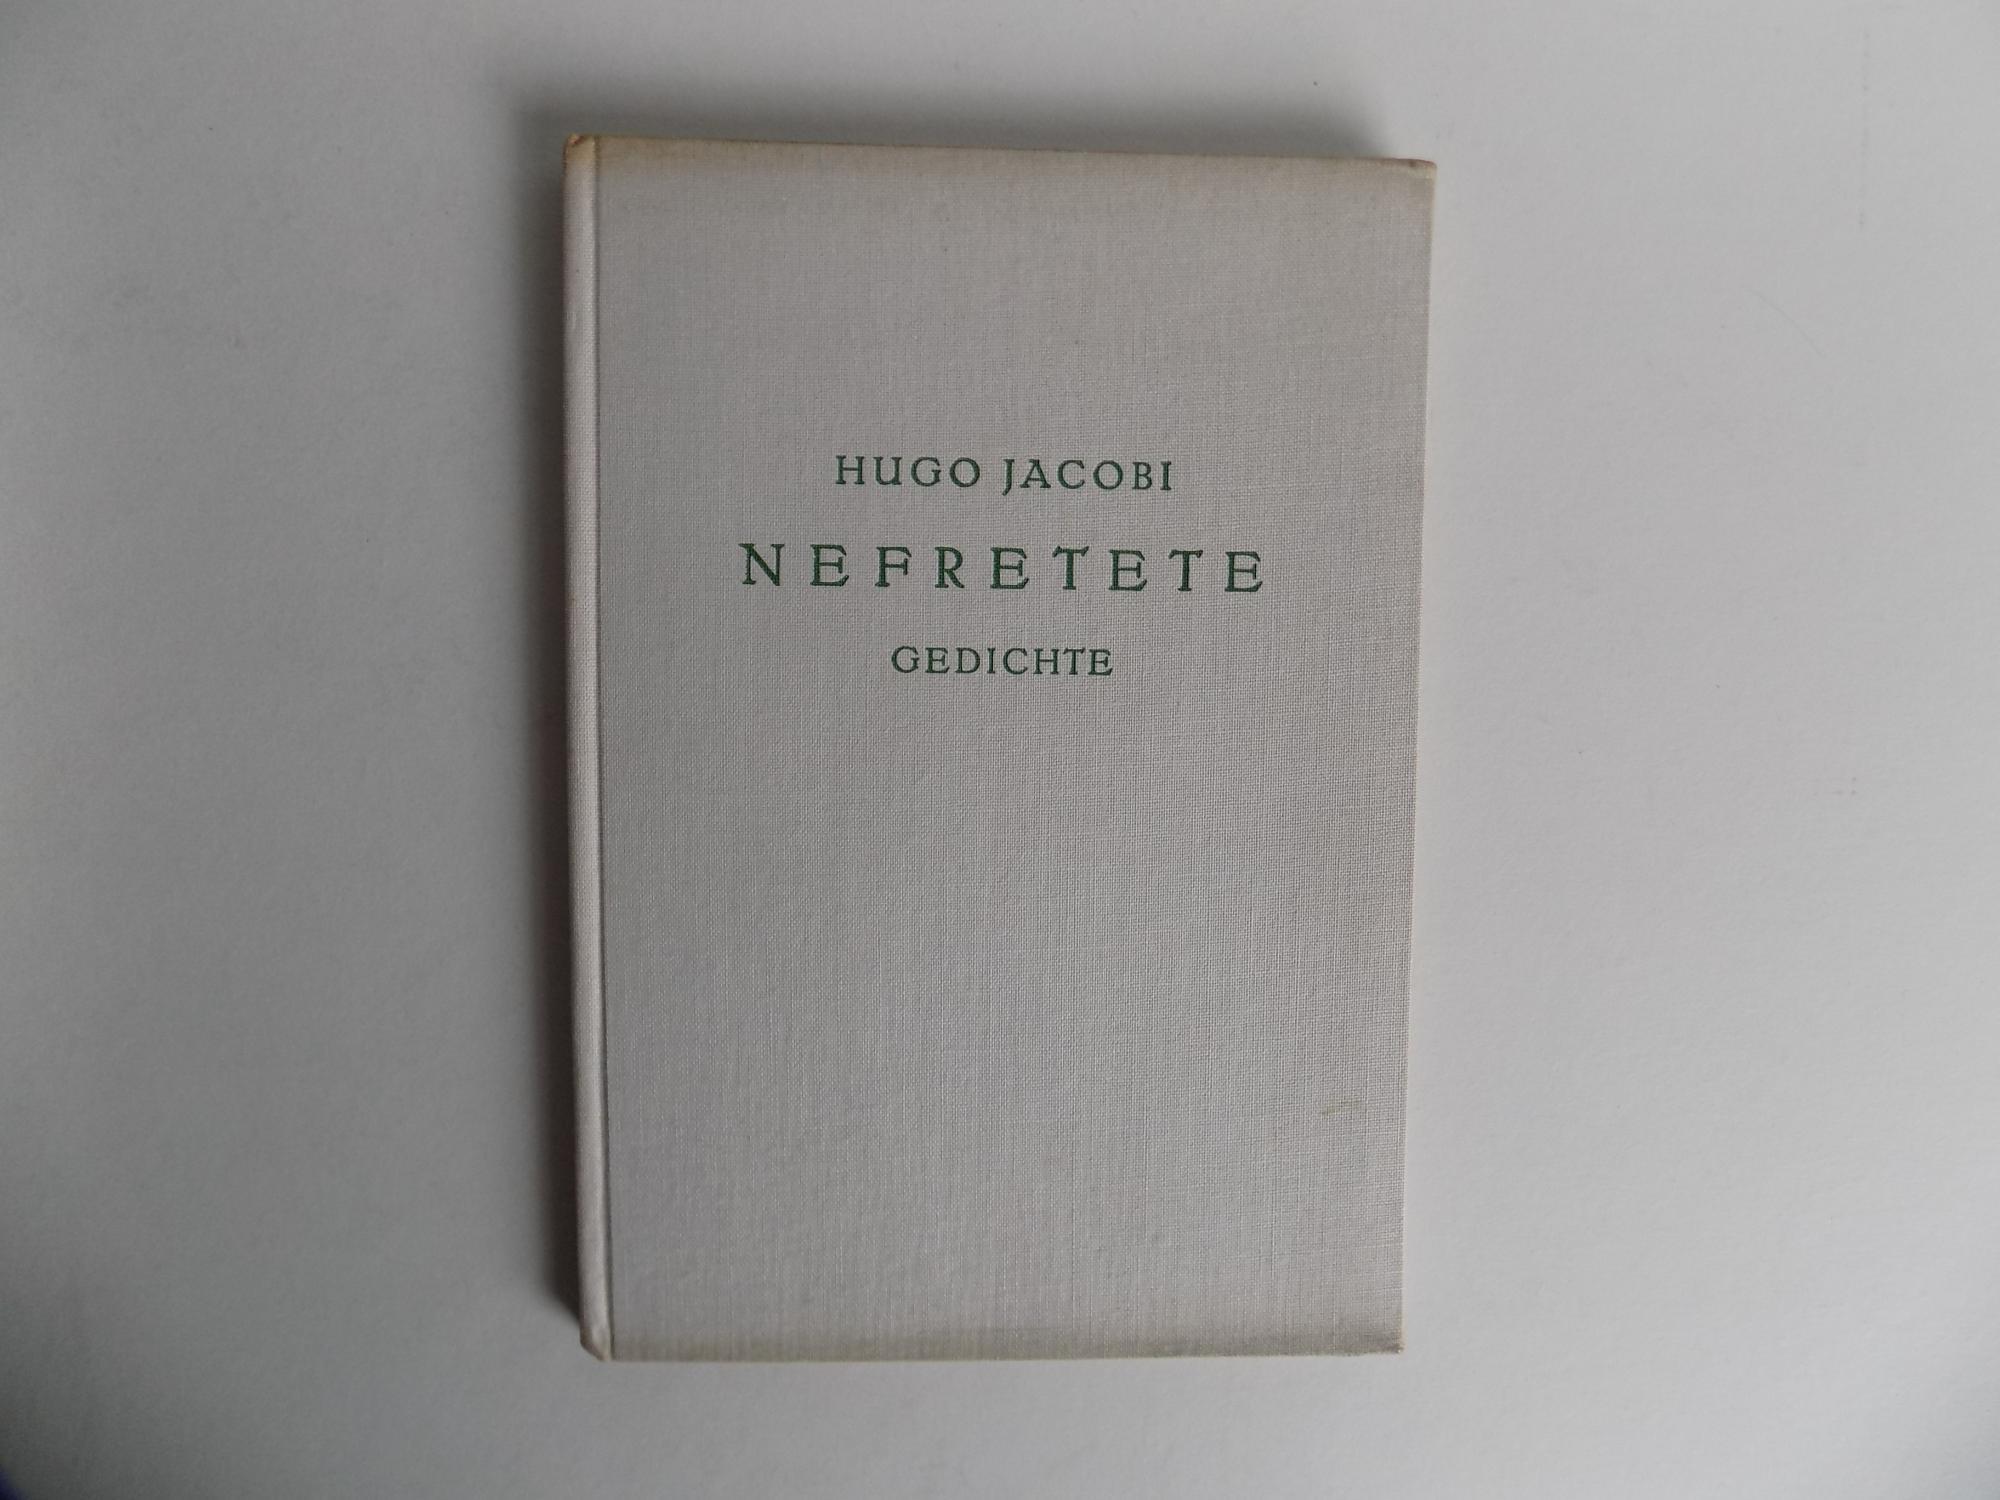 Nefretete. Gedichte.: Jacobi, Hugo (signiert